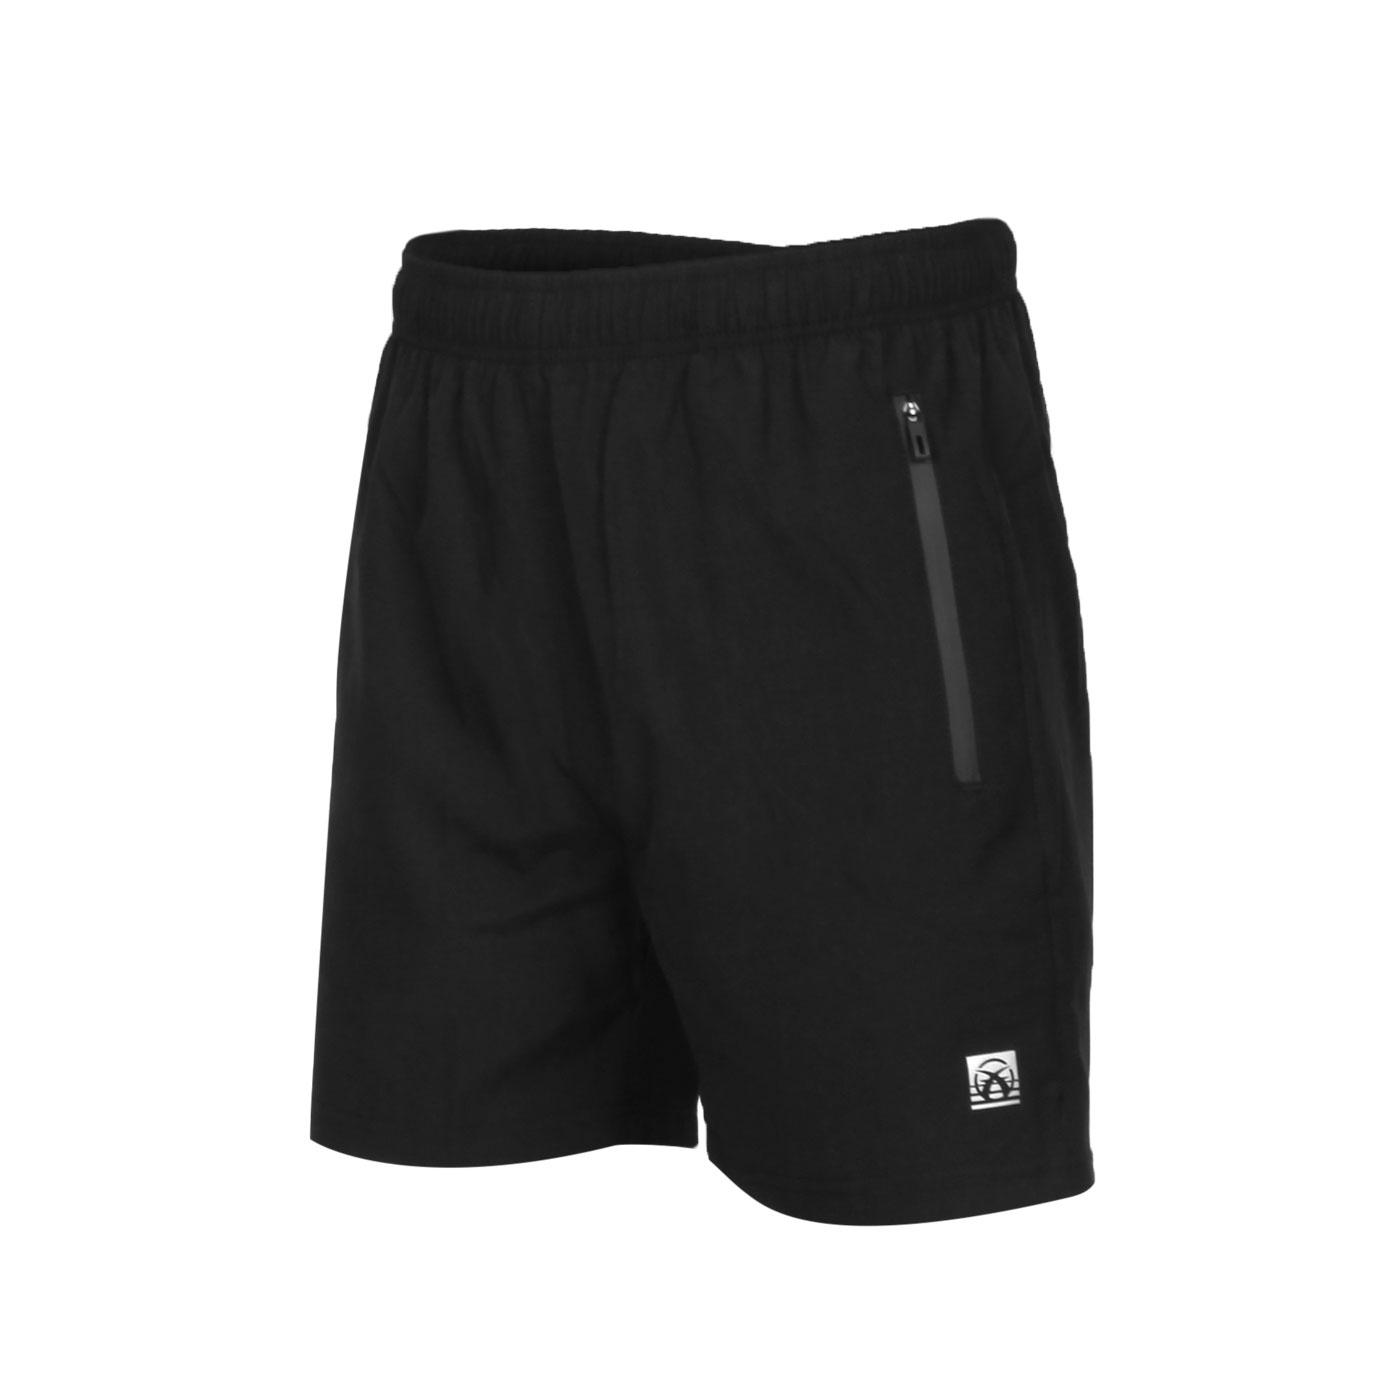 FIRESTAR 男款彈性平織短褲 C0513-10 - 黑銀